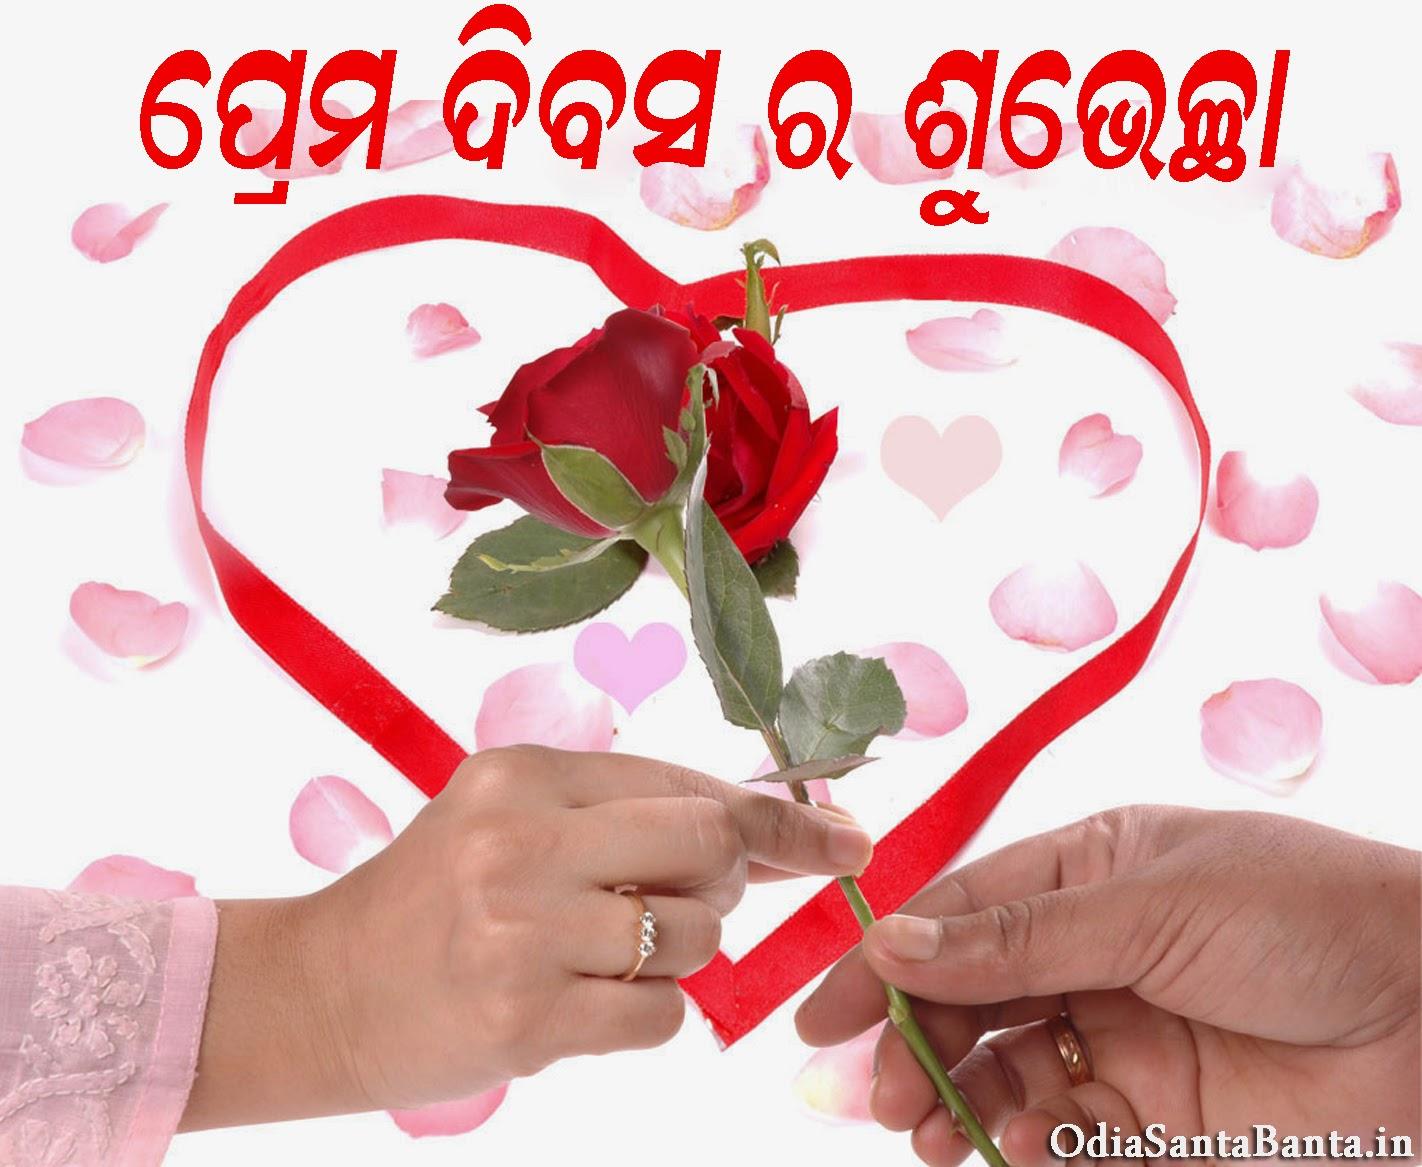 Calendar Rose Day : Odia rose images search results calendar